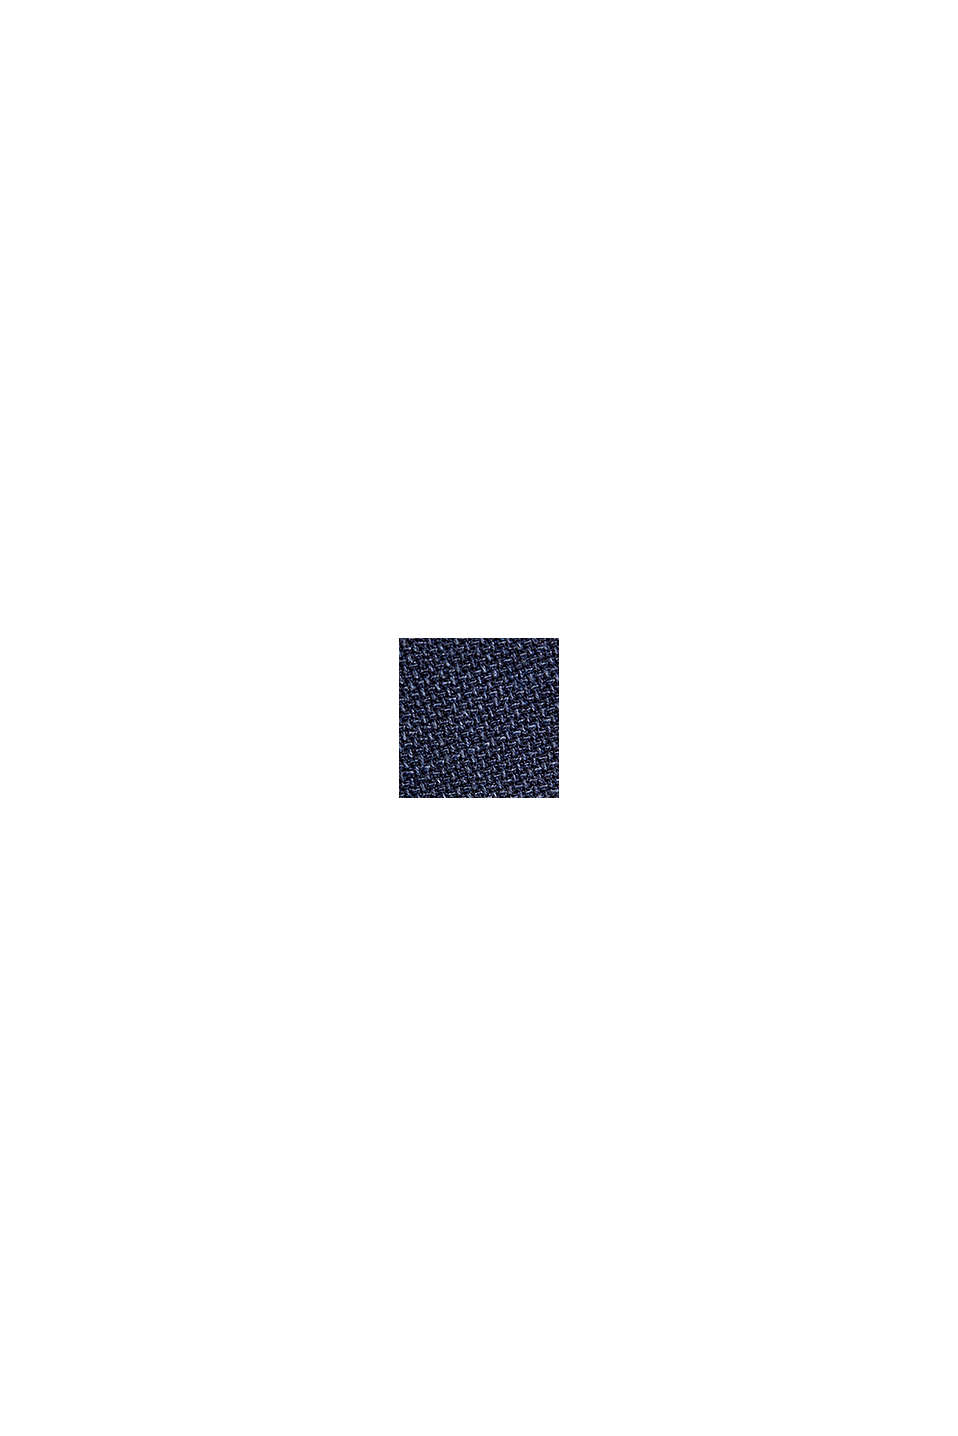 COOLMAX® CHECK Mix+Match: Sakko, GREY BLUE, swatch